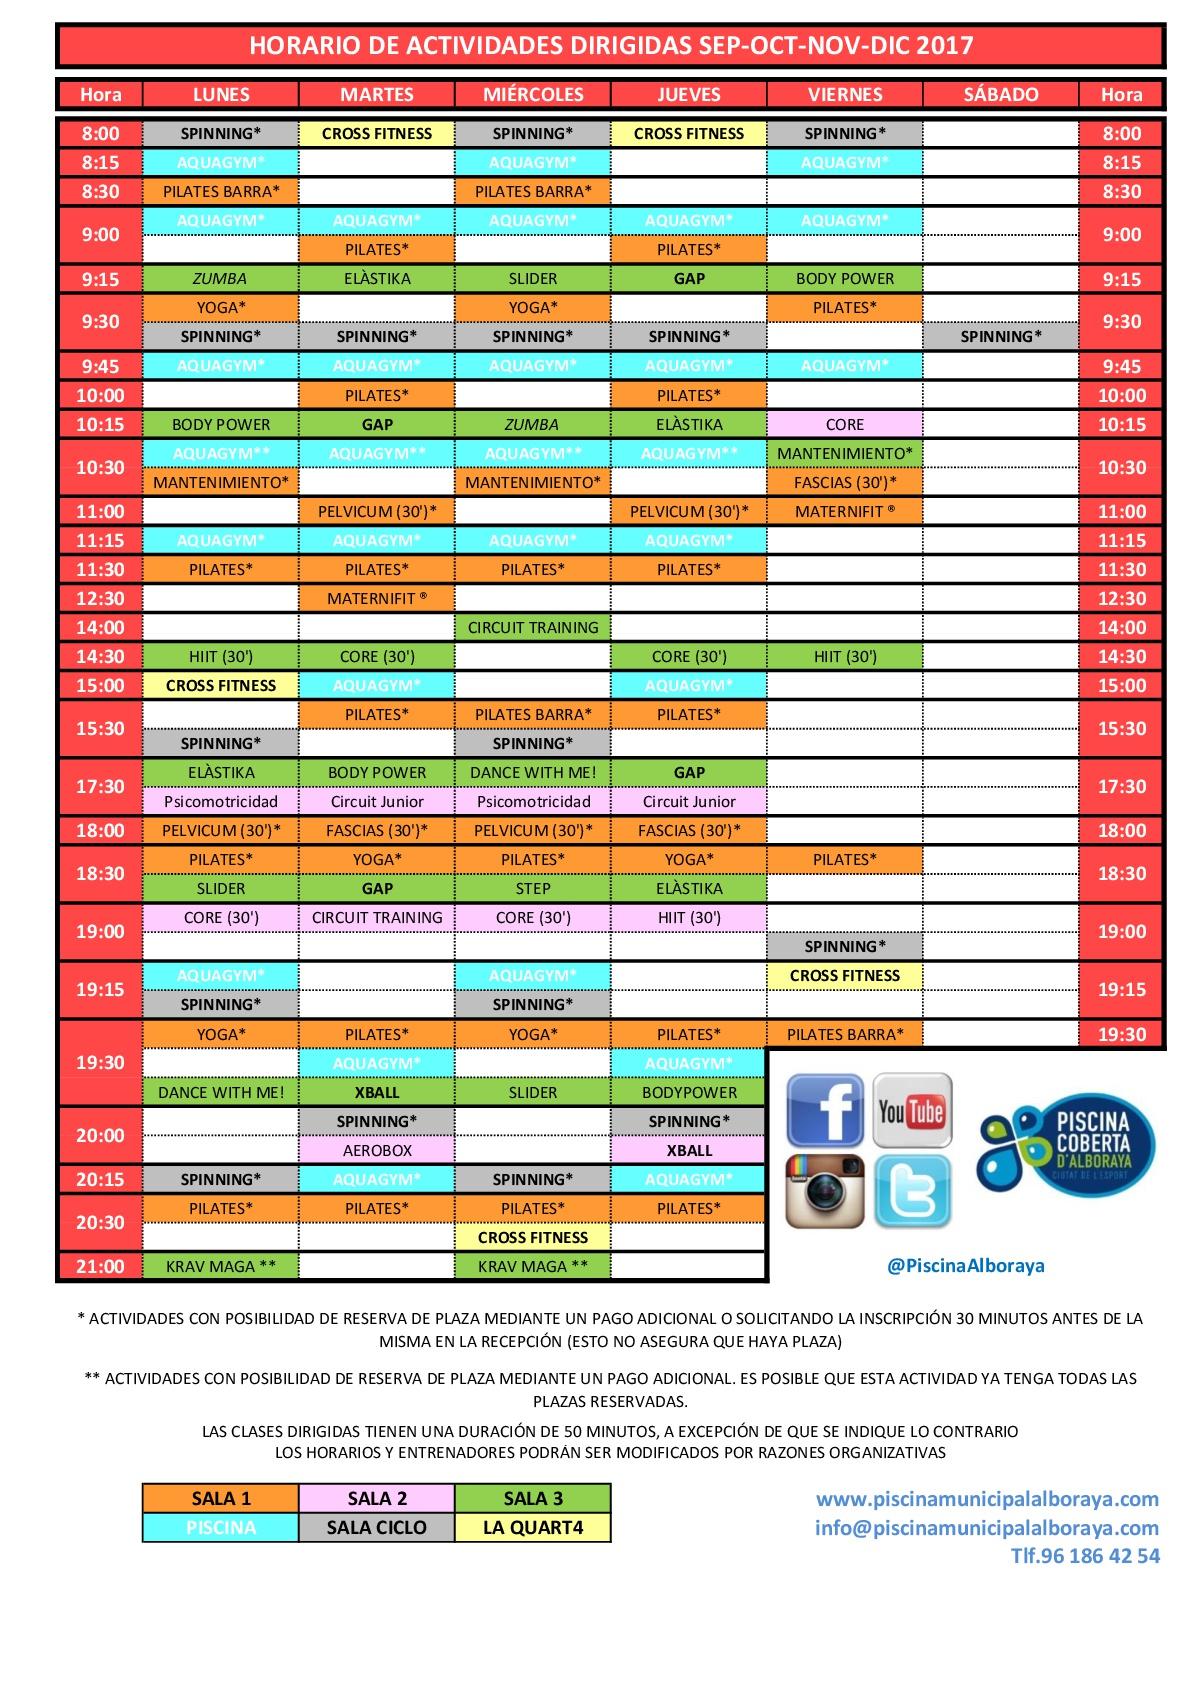 Piscina cubierta de alboraya piscina municipal cubierta for Piscina xirivella horario 2017